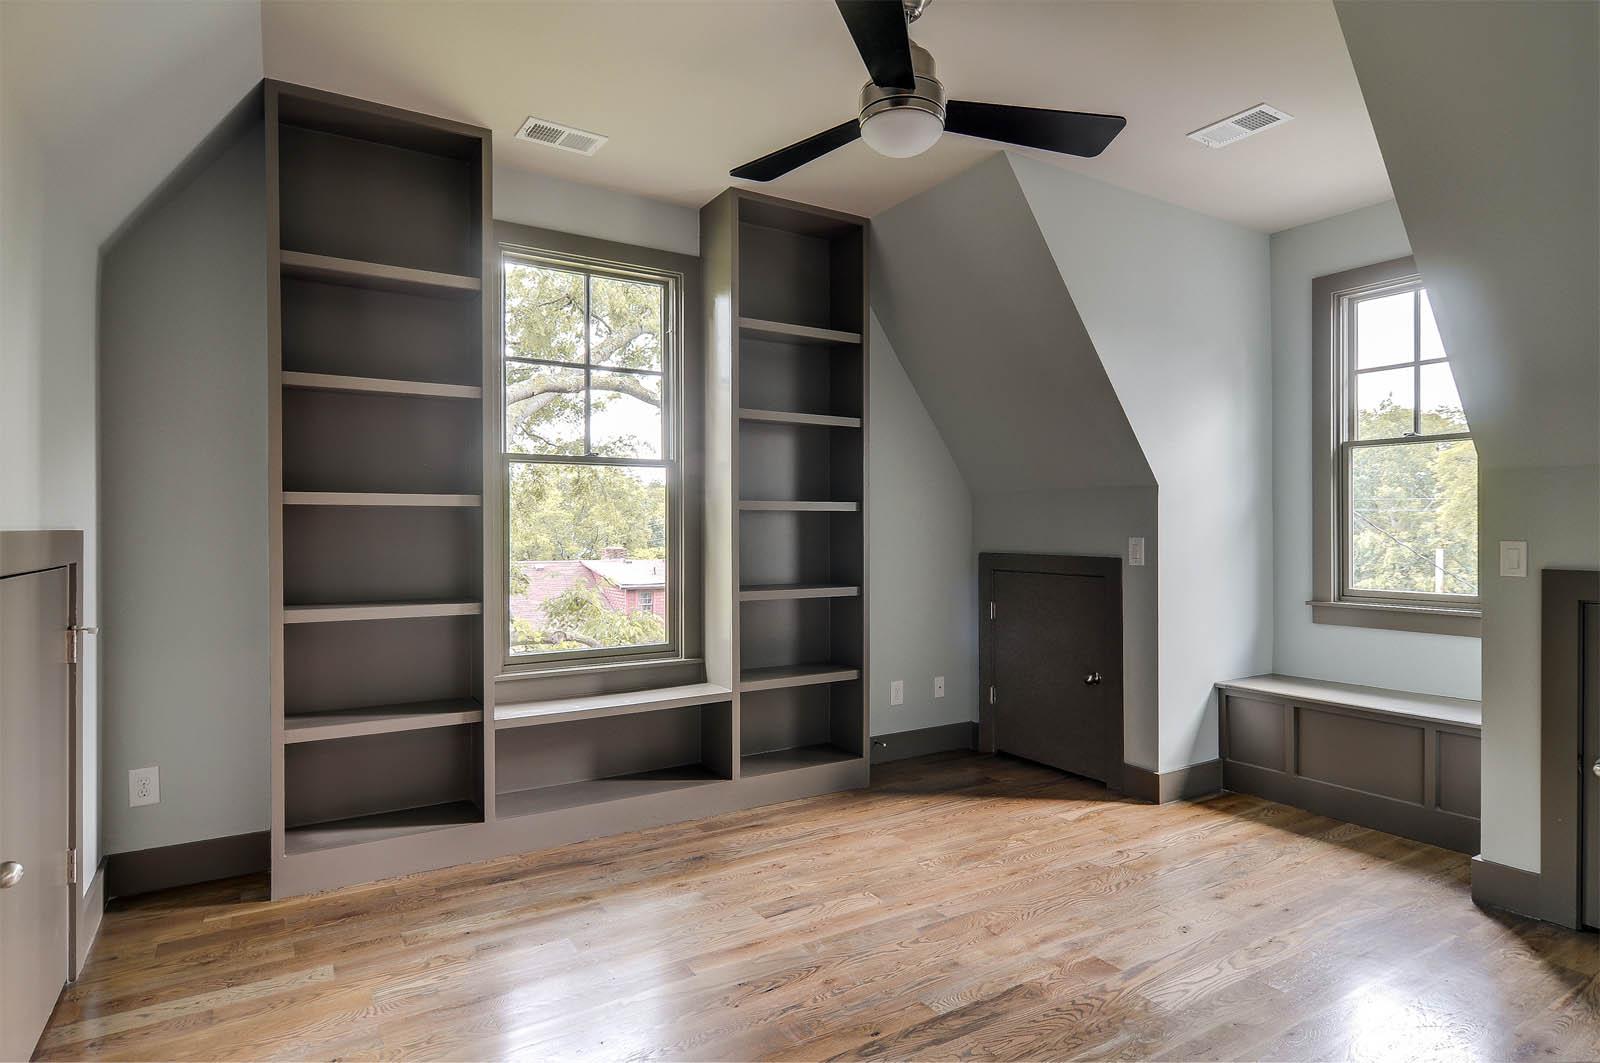 painting order ceiling walls trim